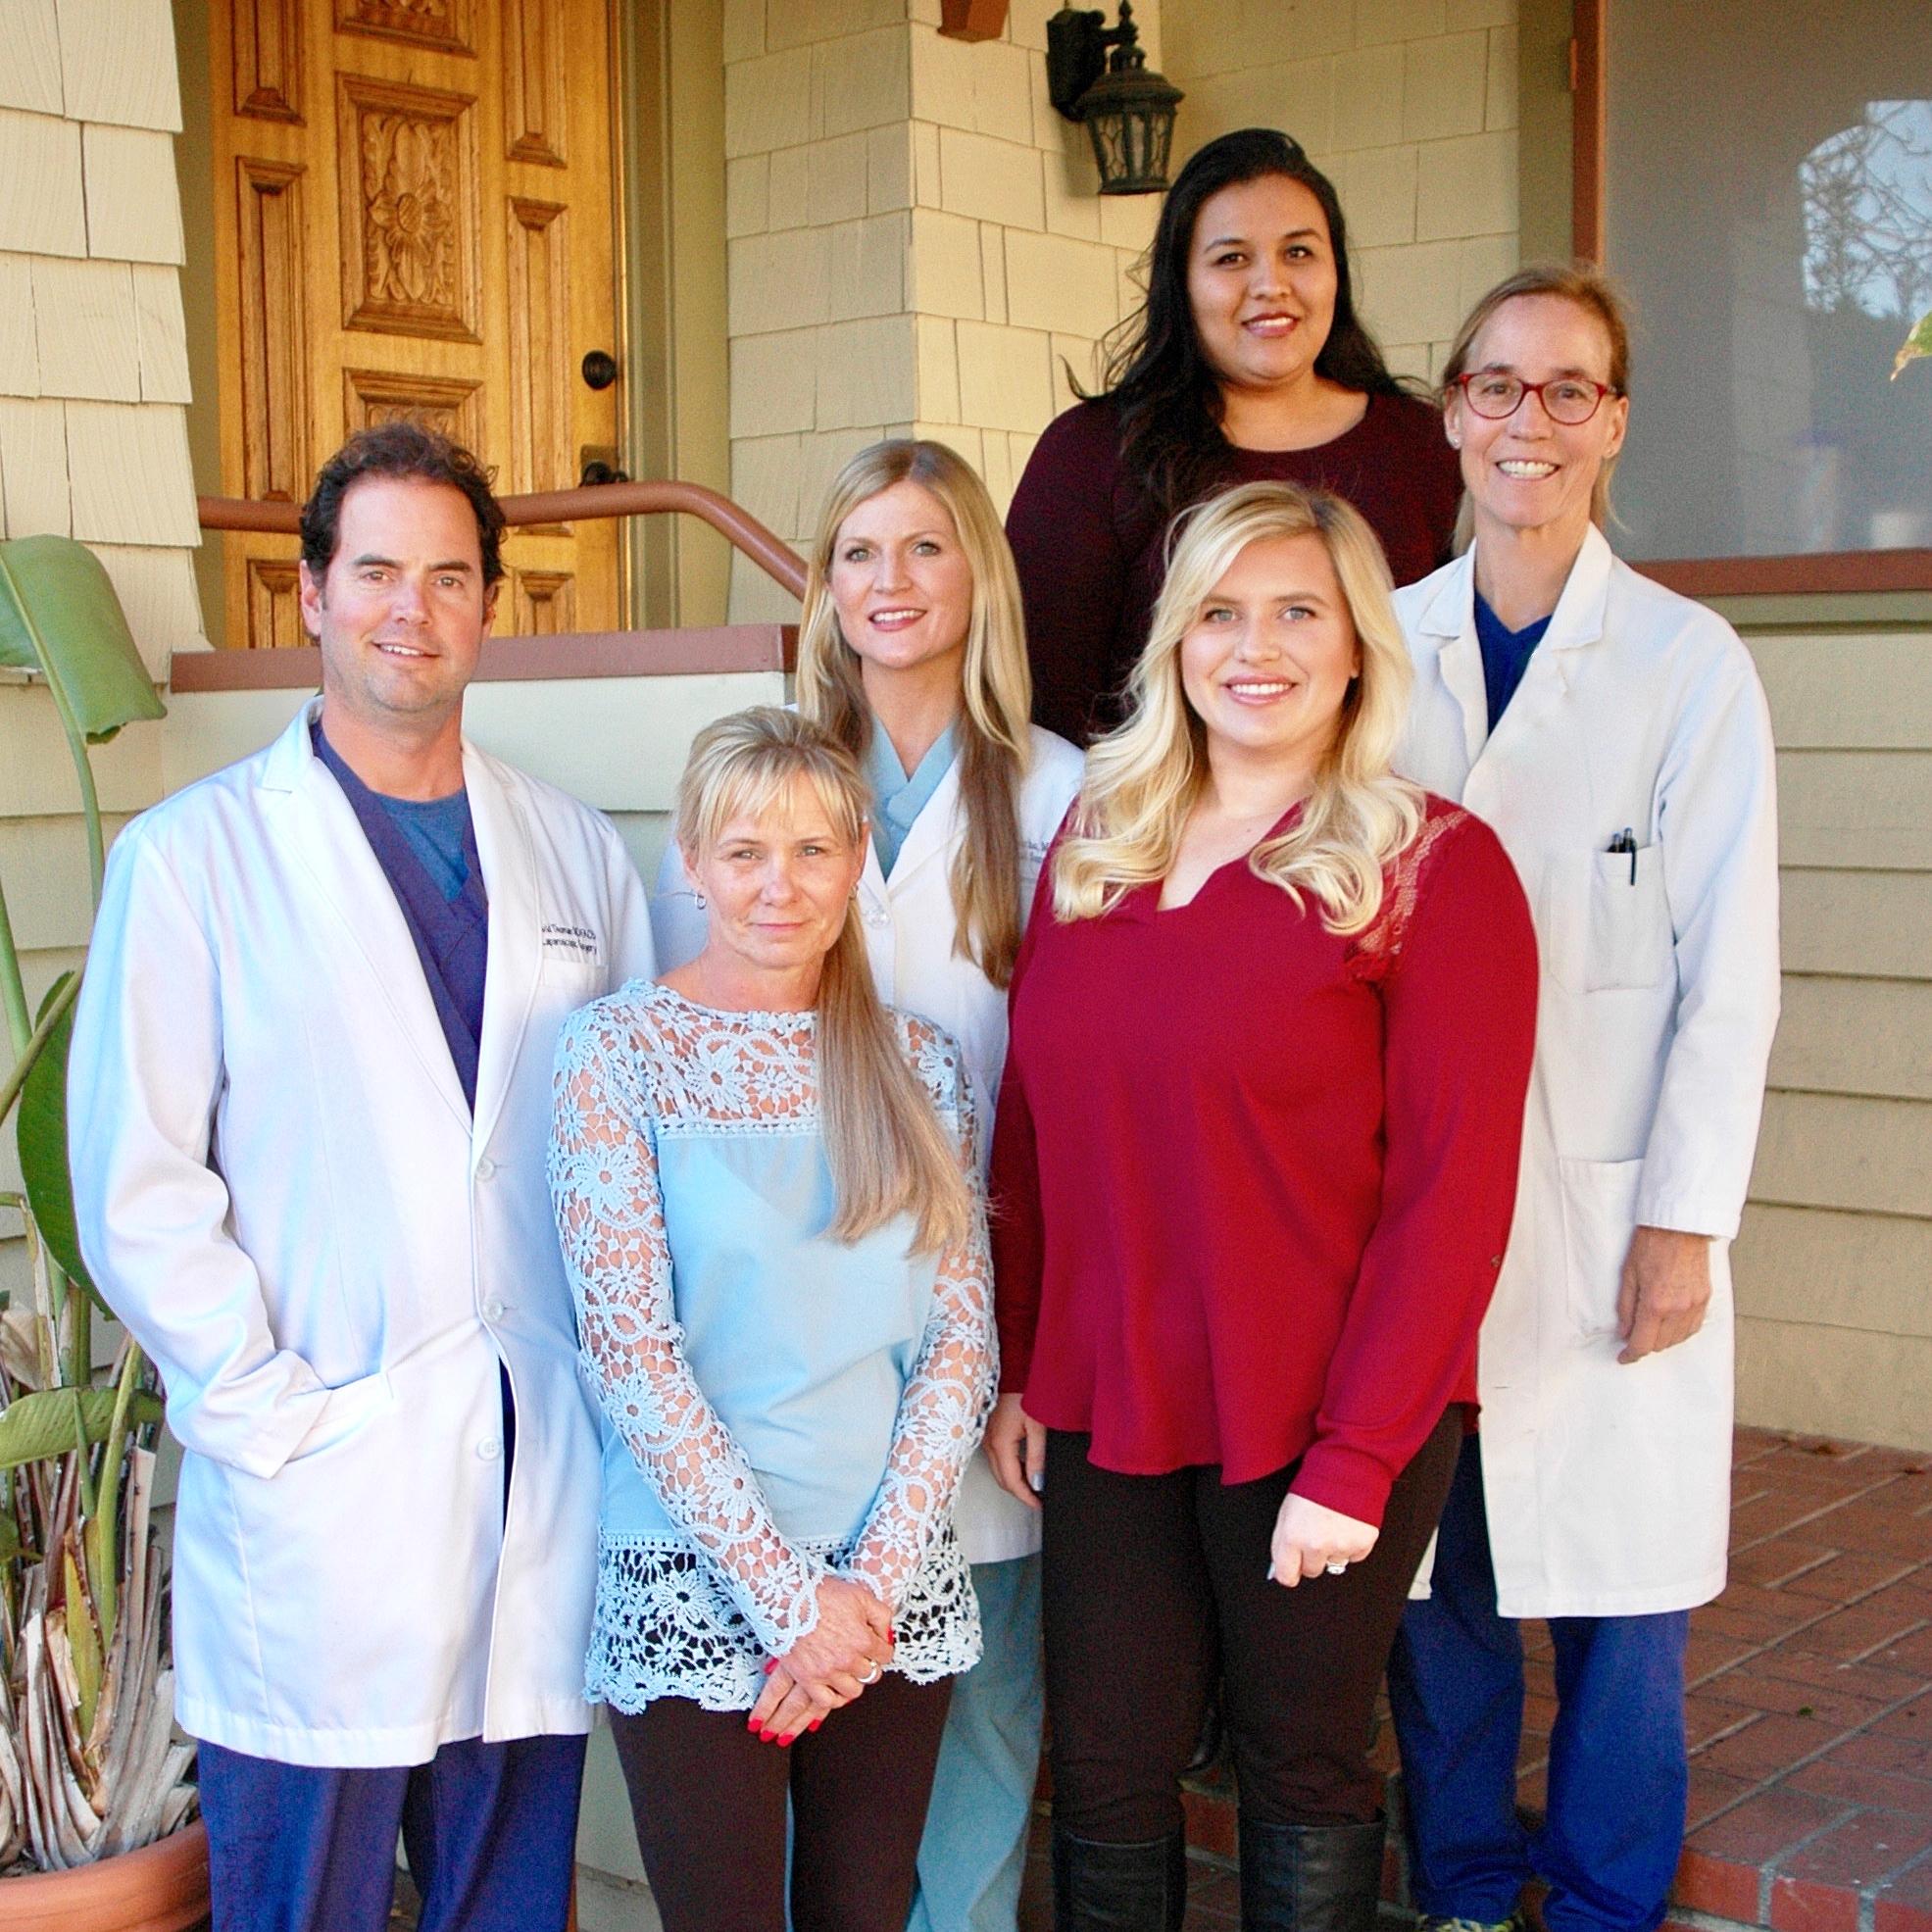 Advanced Surgical Santa Barbara